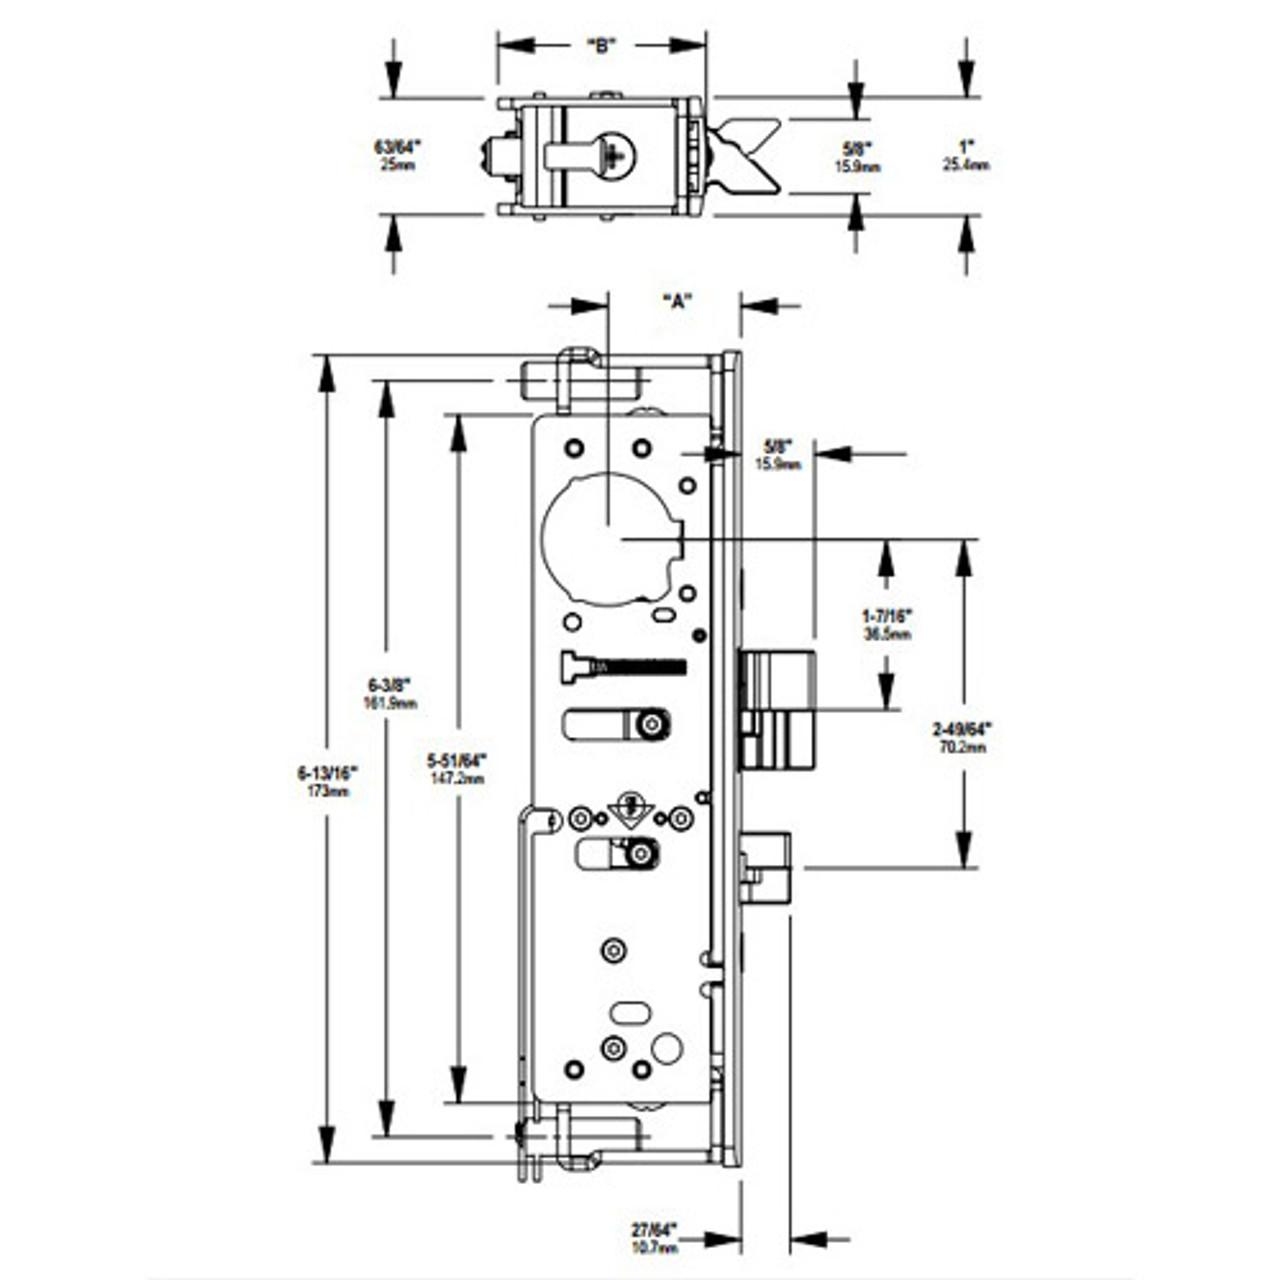 4300-40-102-313 Adams Rite Electrified Deadlatch Dimensional View